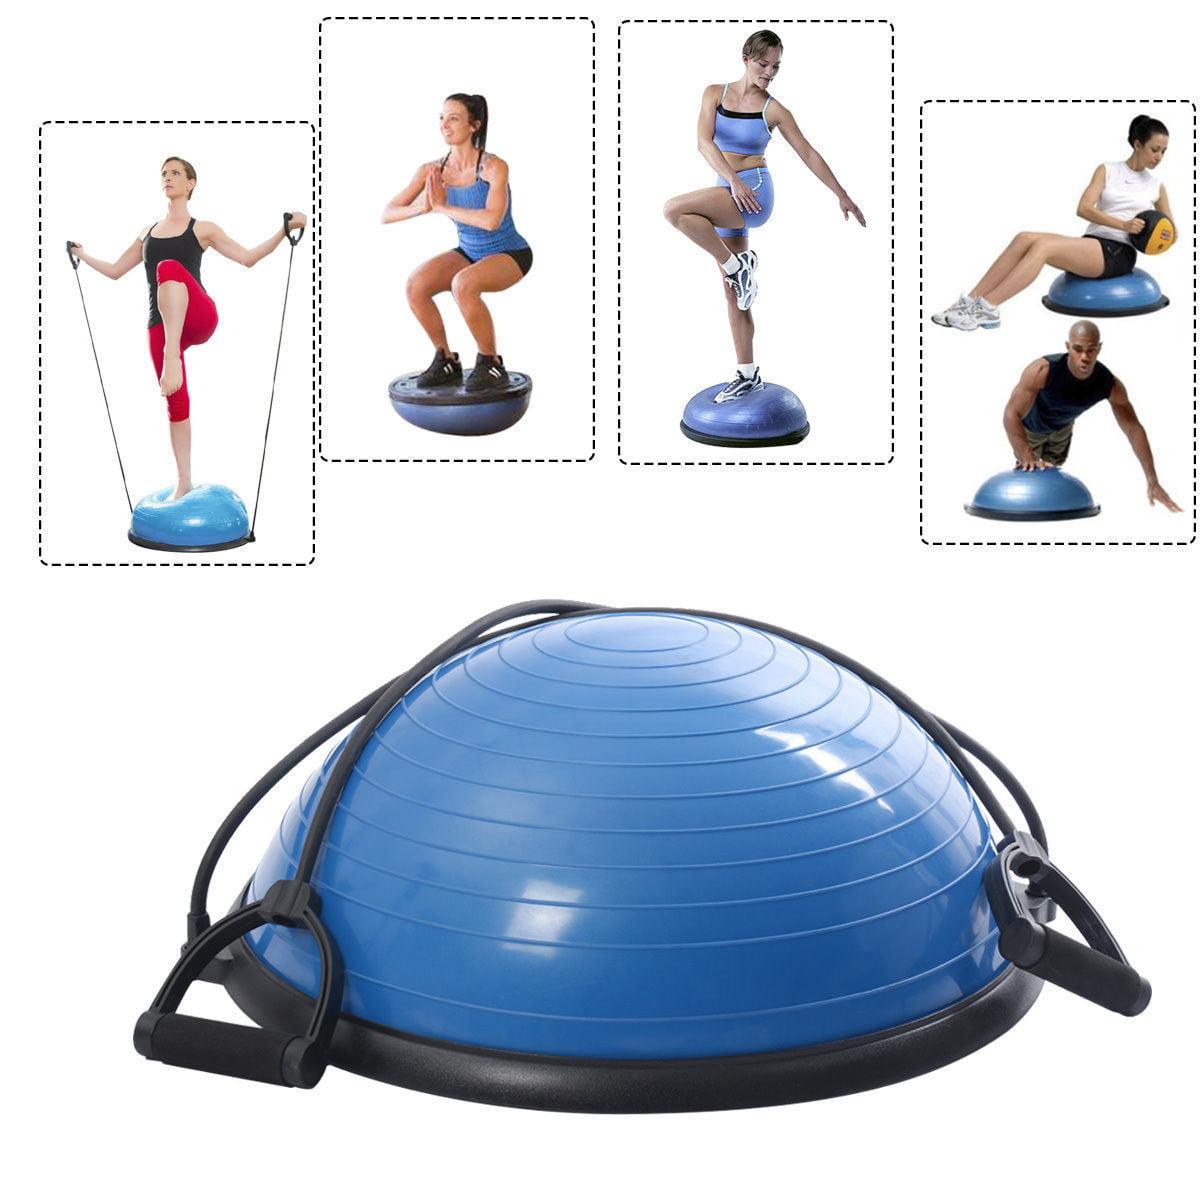 Gaiam Balance Ball Kamisco